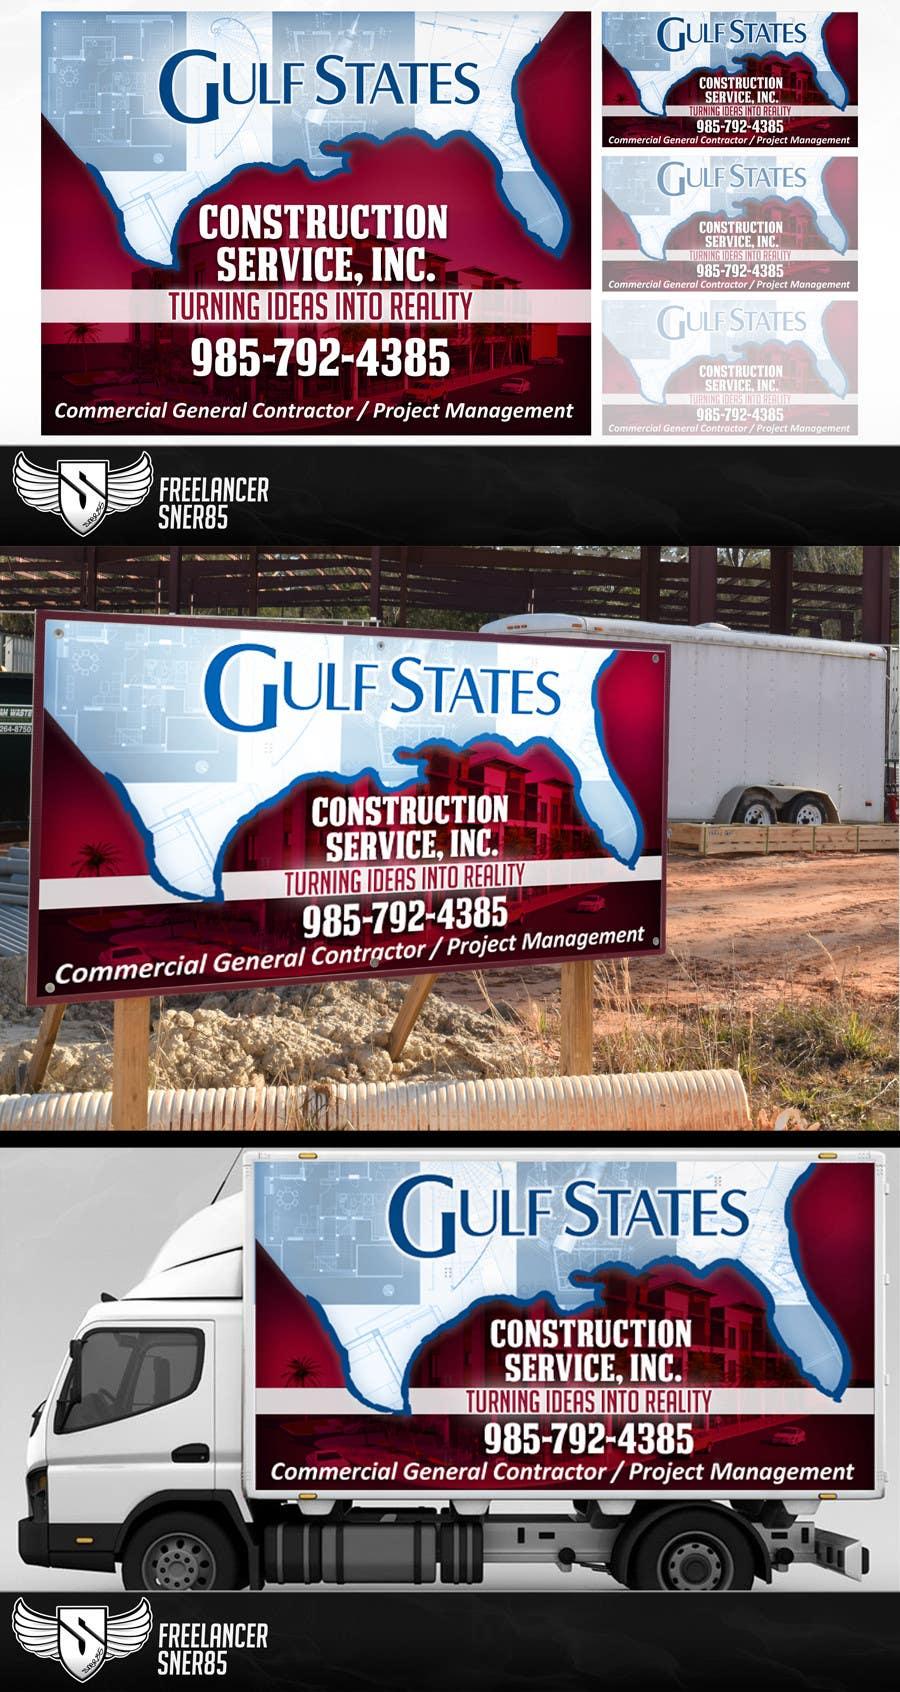 Kilpailutyö #12 kilpailussa Design a Construction Company's Sign